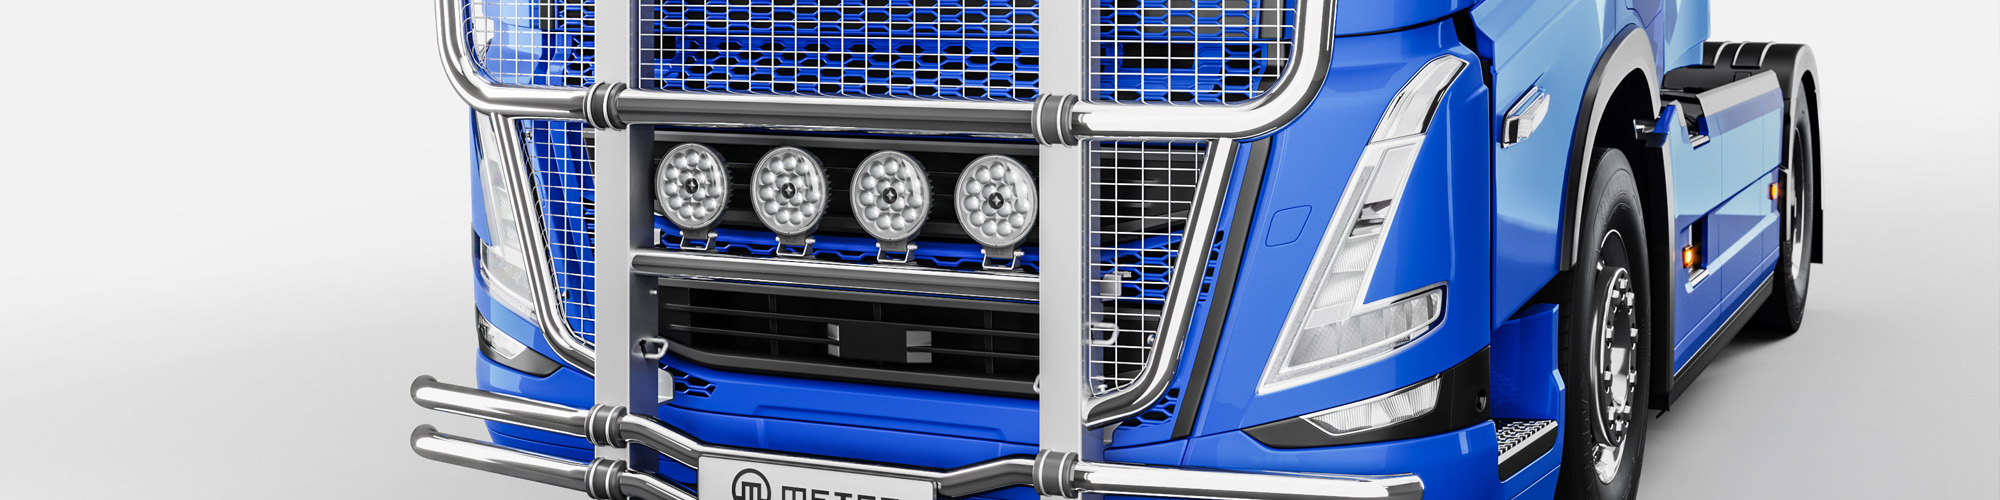 Frontskydd Volvo FH5 2021+ bakgrundsbild